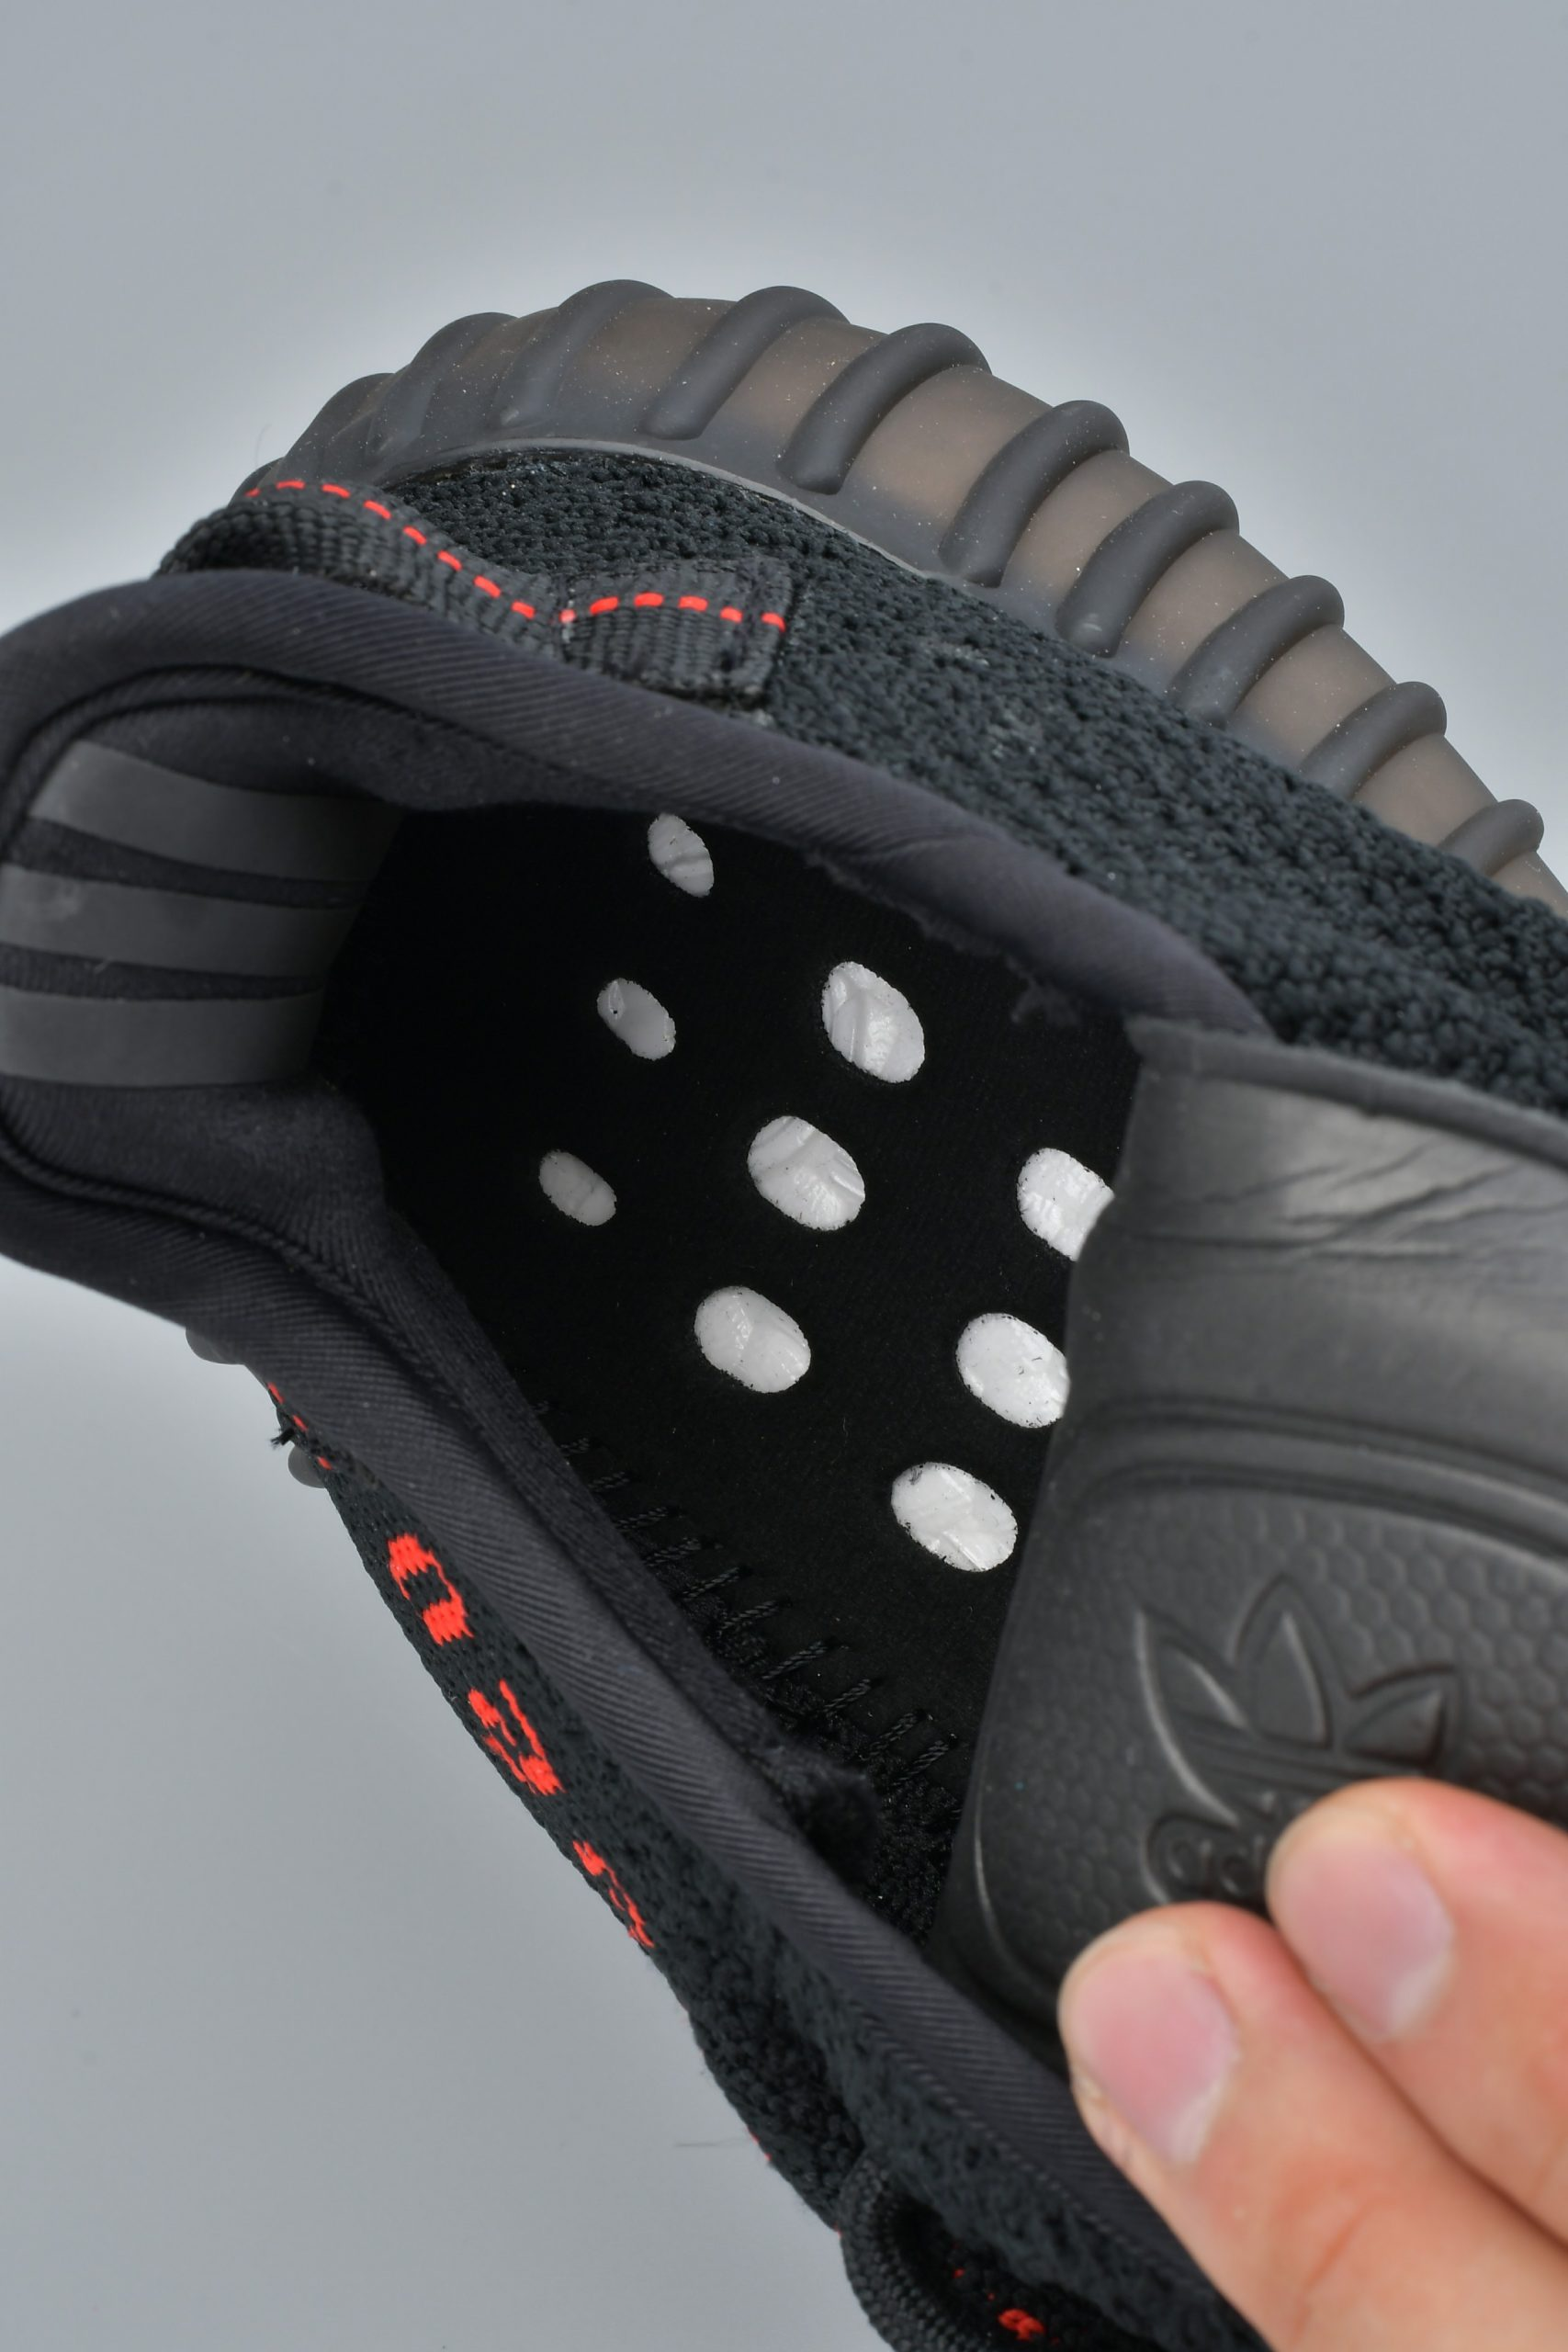 Giày Adidas Yeezy Boost 350 V2 Bred10